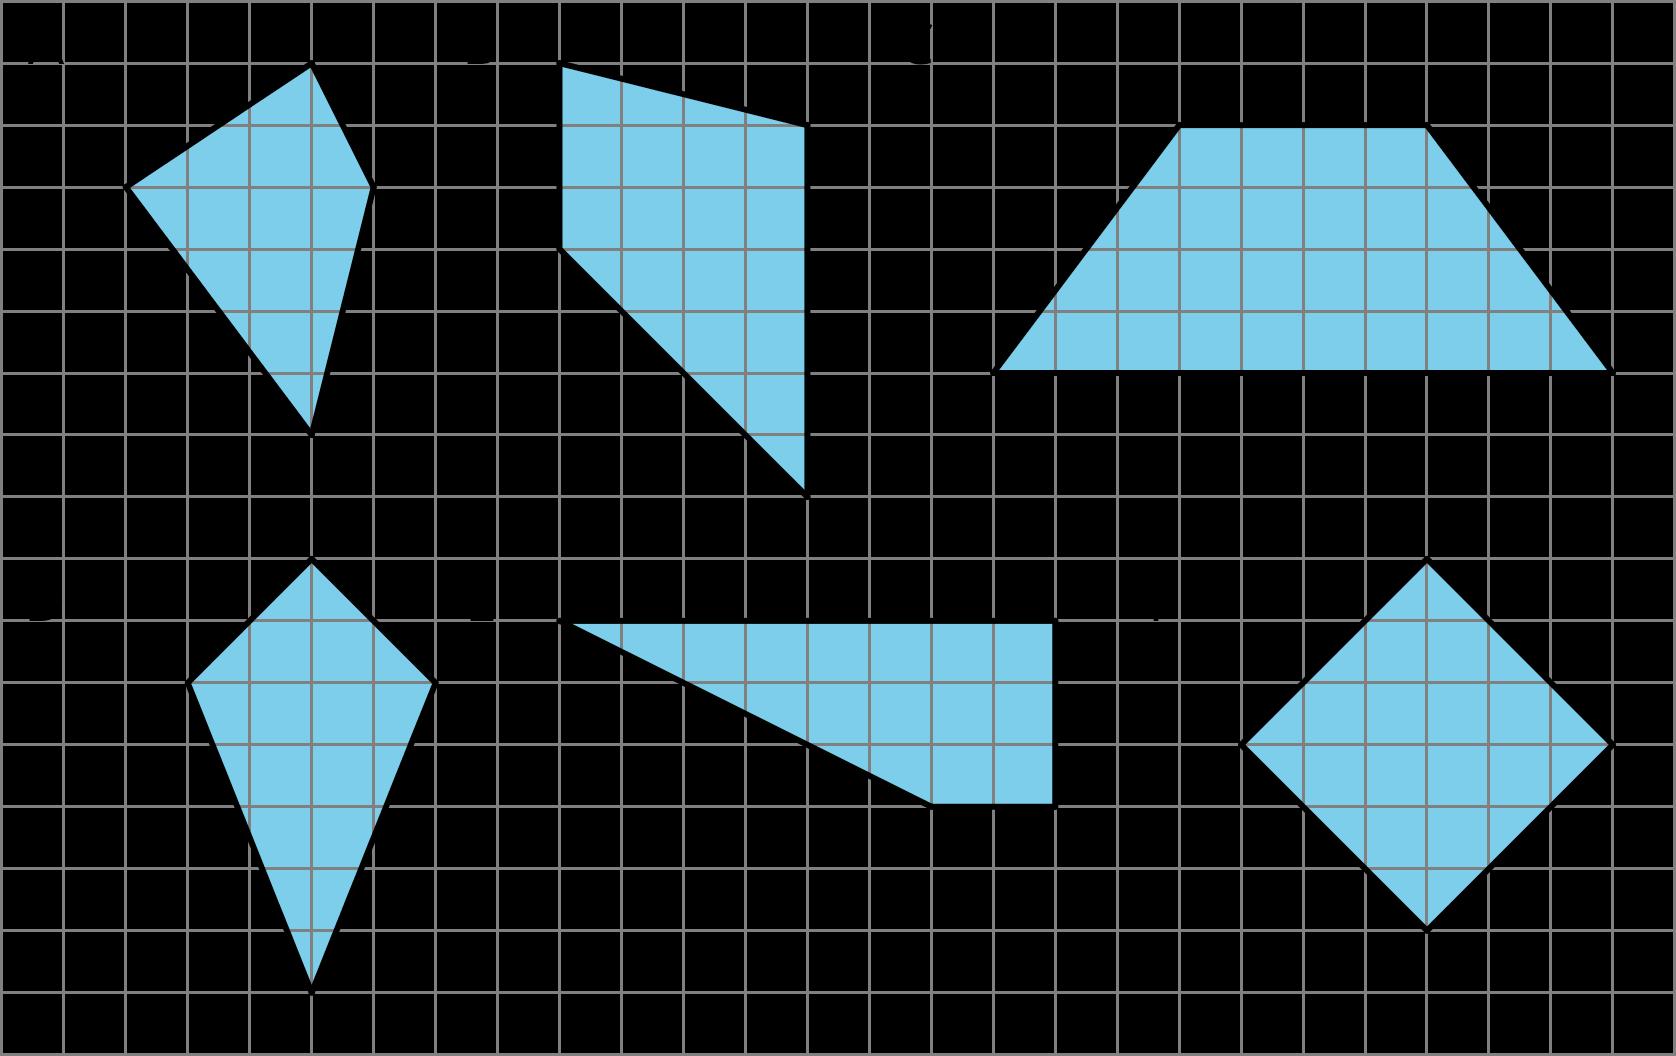 Six quadrilaterals labeled A--F.